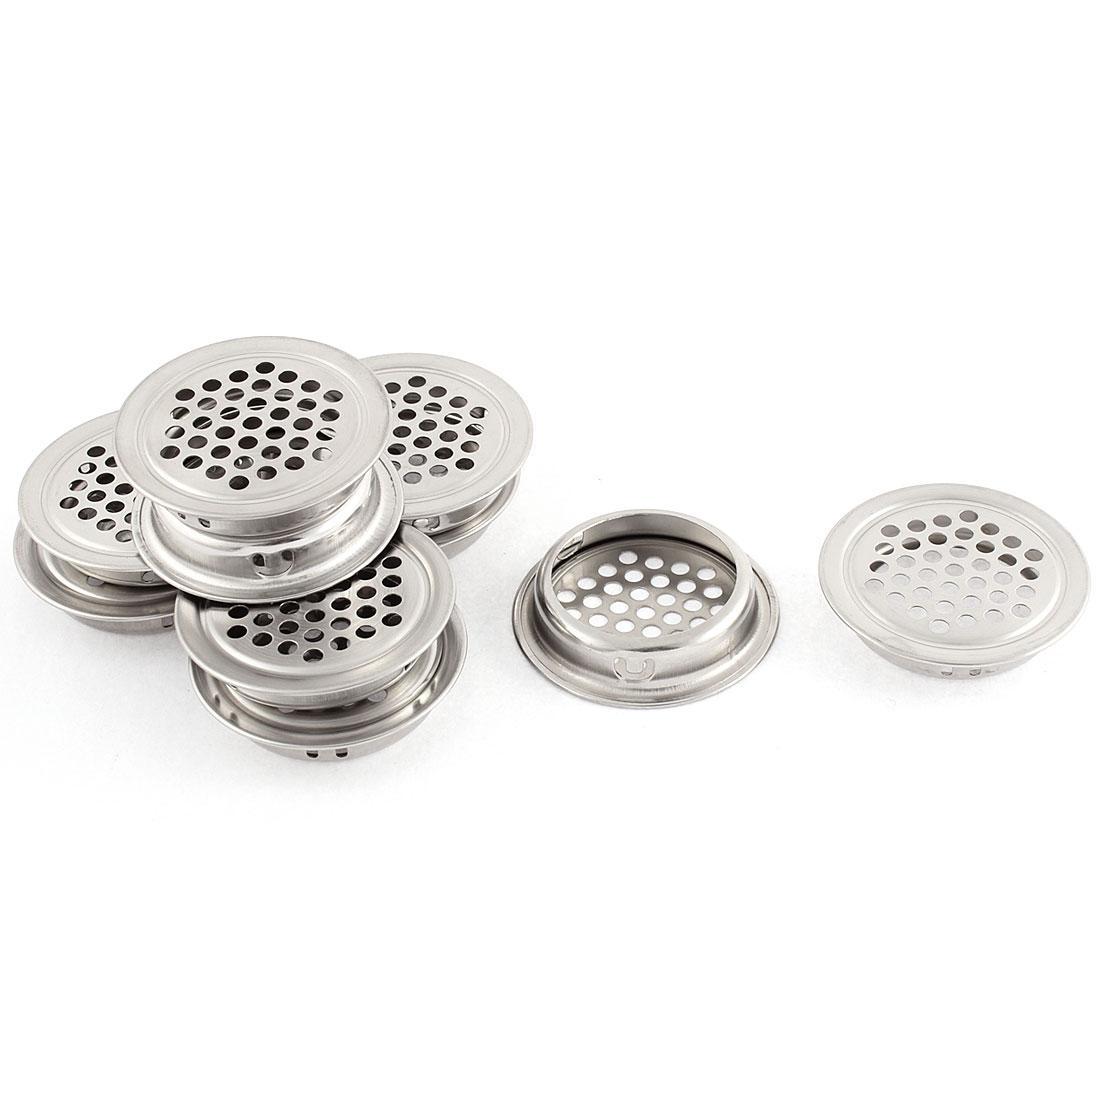 Silver Tone Round Mesh Hole Air Vents Louvers 10 PCS